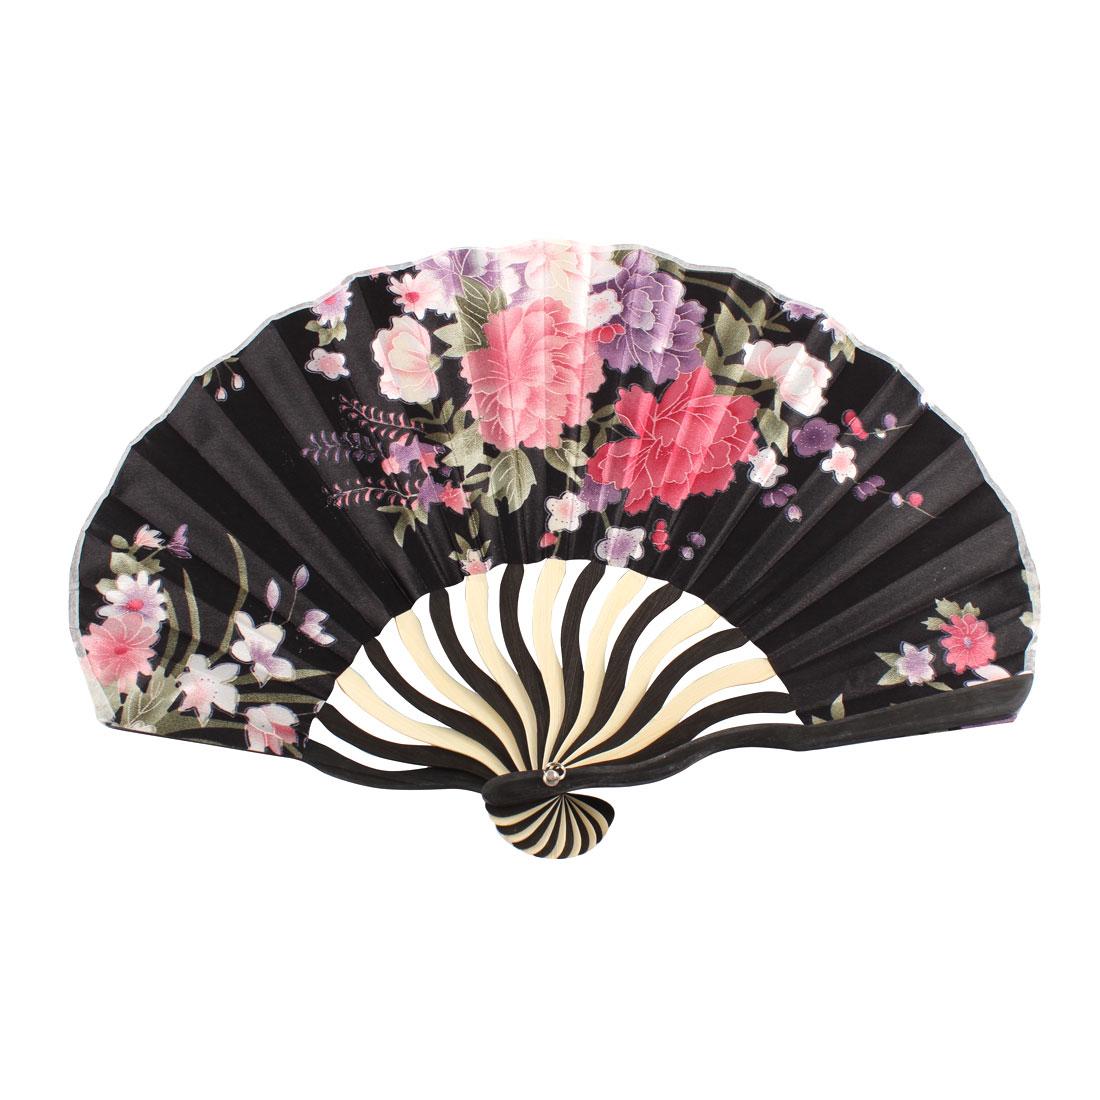 Lady Summer Wedding Party Flower Printed Nylon Bamboo Rib Foldable Hand Fan Fans Art Gift Decor